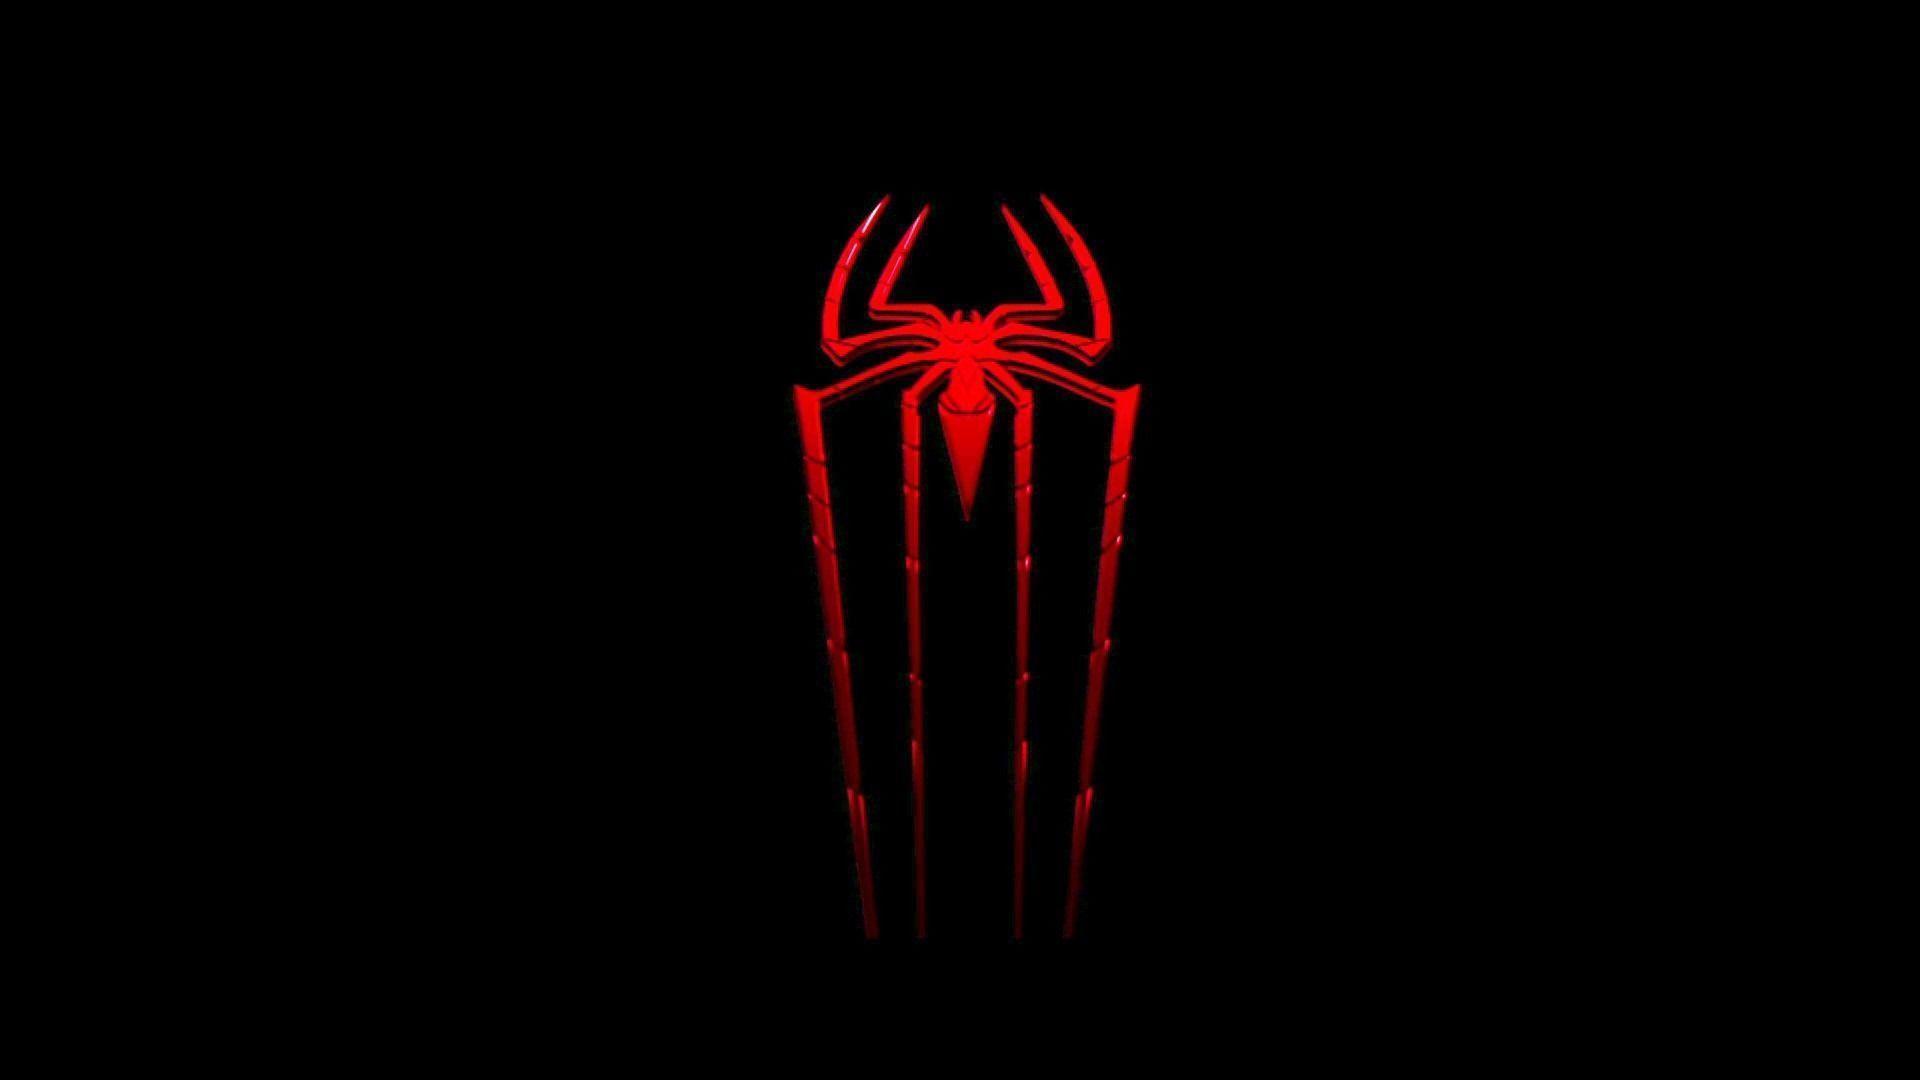 Top Wallpaper Logo Spiderman - FErxUqm  Gallery_572434.jpg